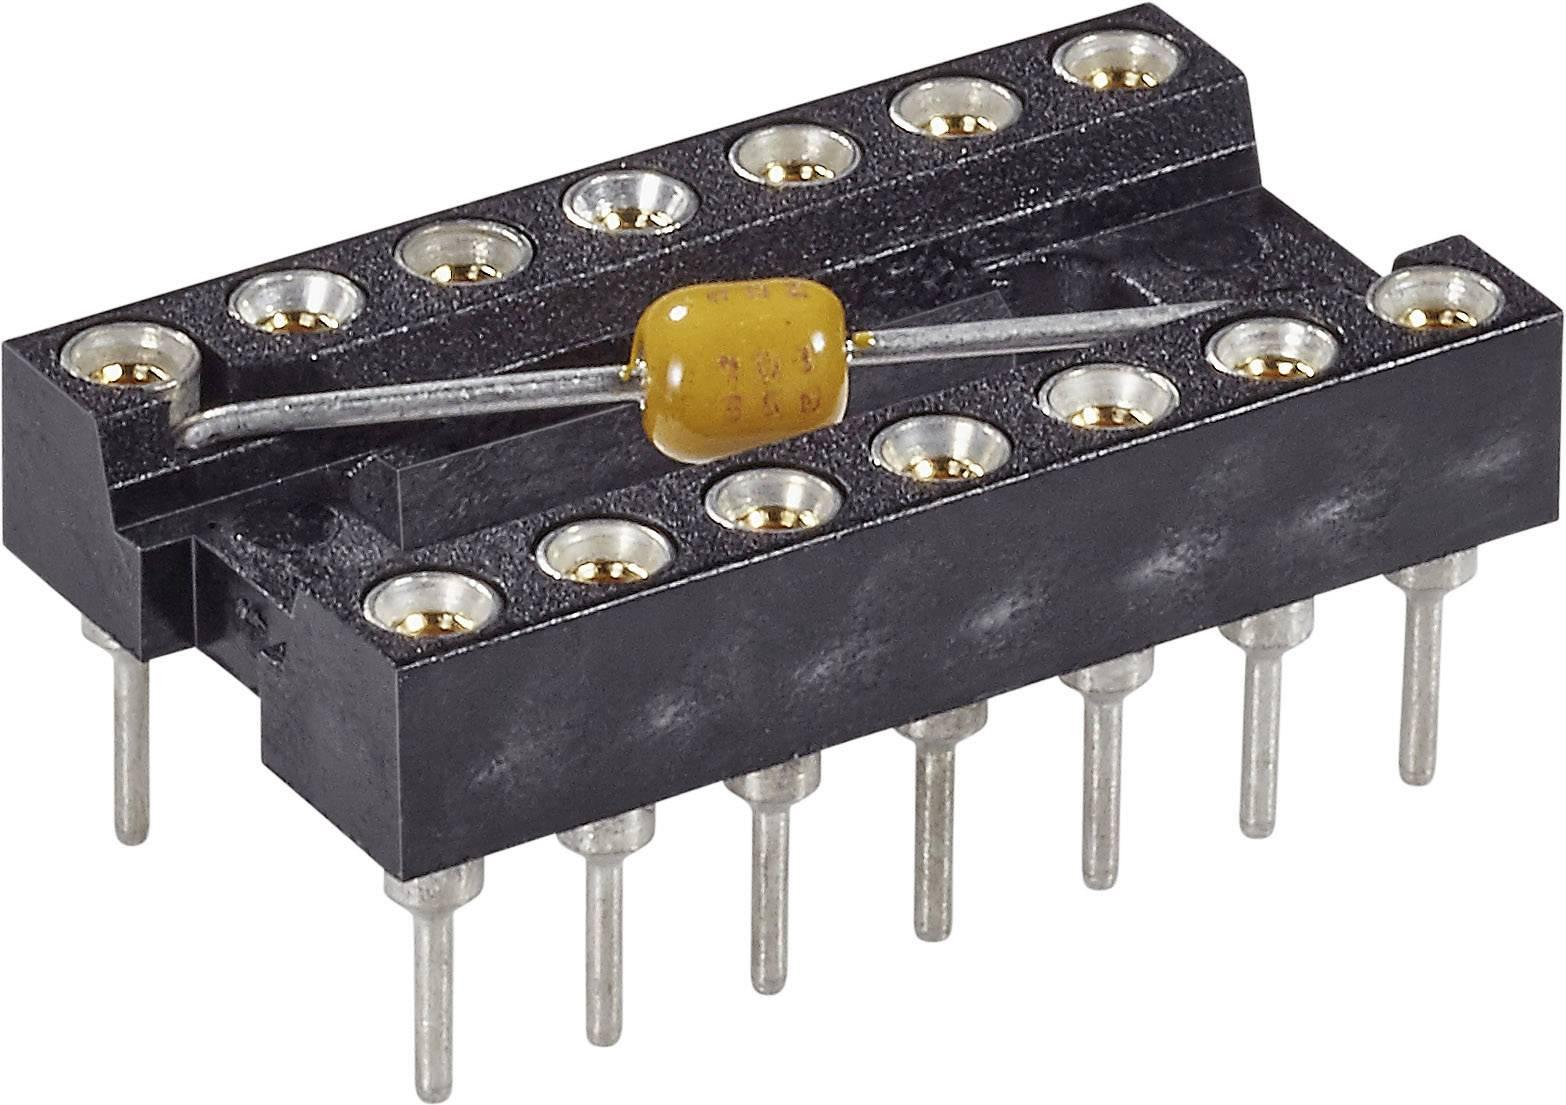 IC pätica MPE Garry 001-4-020-3-B1STF-XT0 presné kontakty, s kondenzátorom, rozteč 7.62 mm, pólů 20, 1 ks